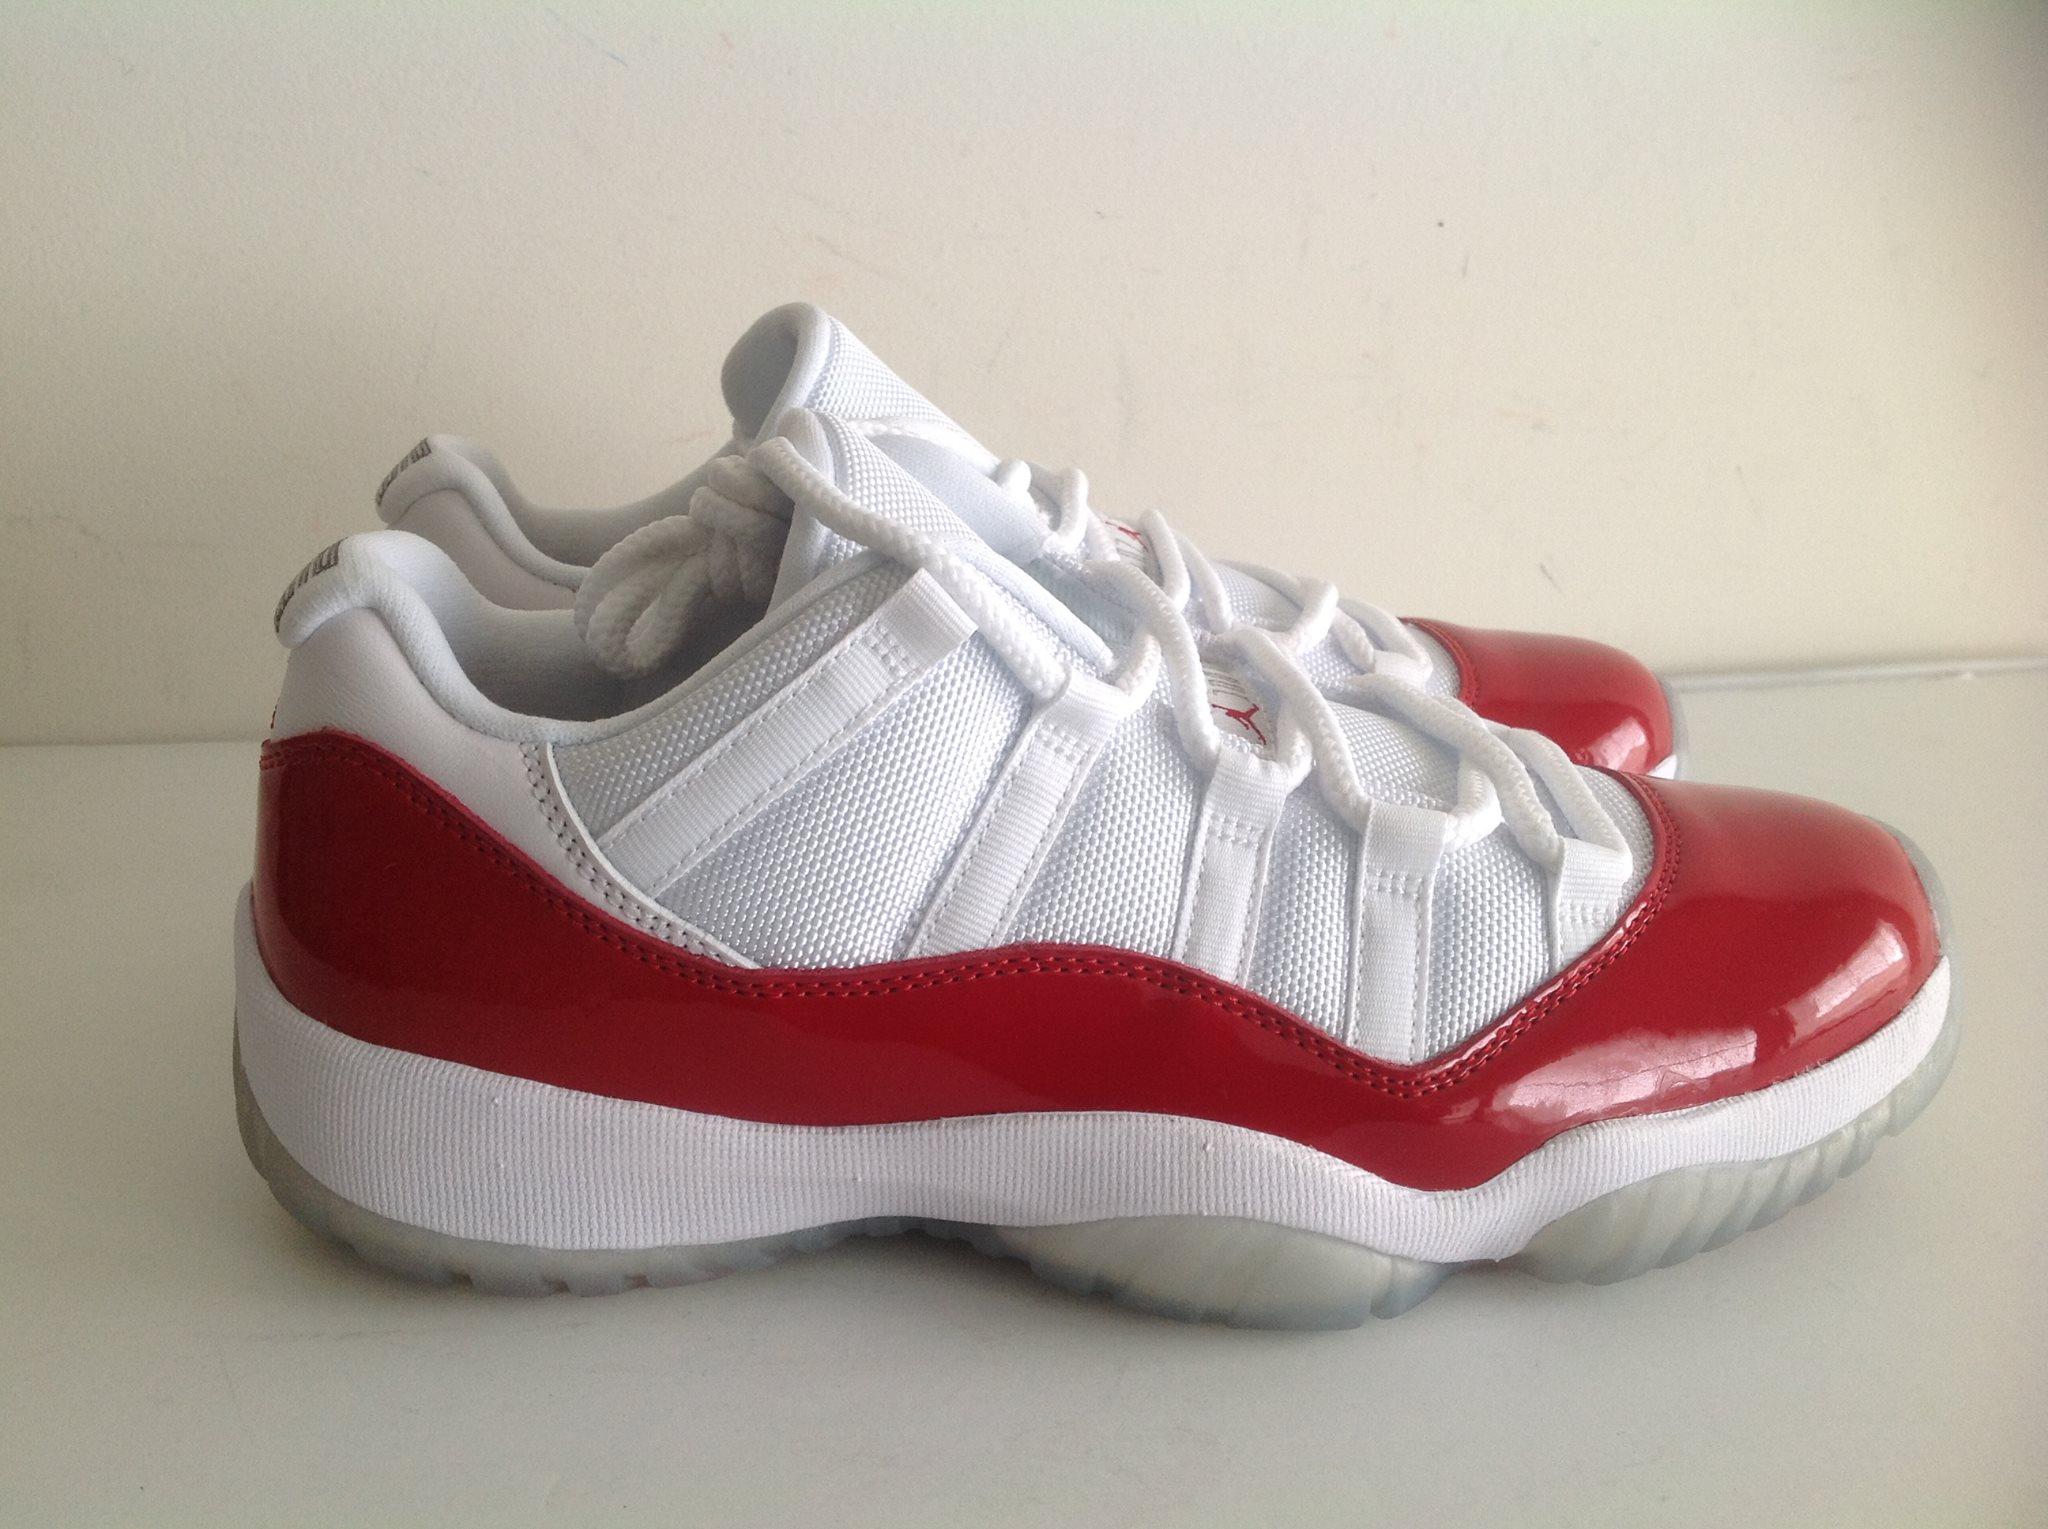 Air Jordan 11 Retro low Cherry White Varsity Red 528895 102